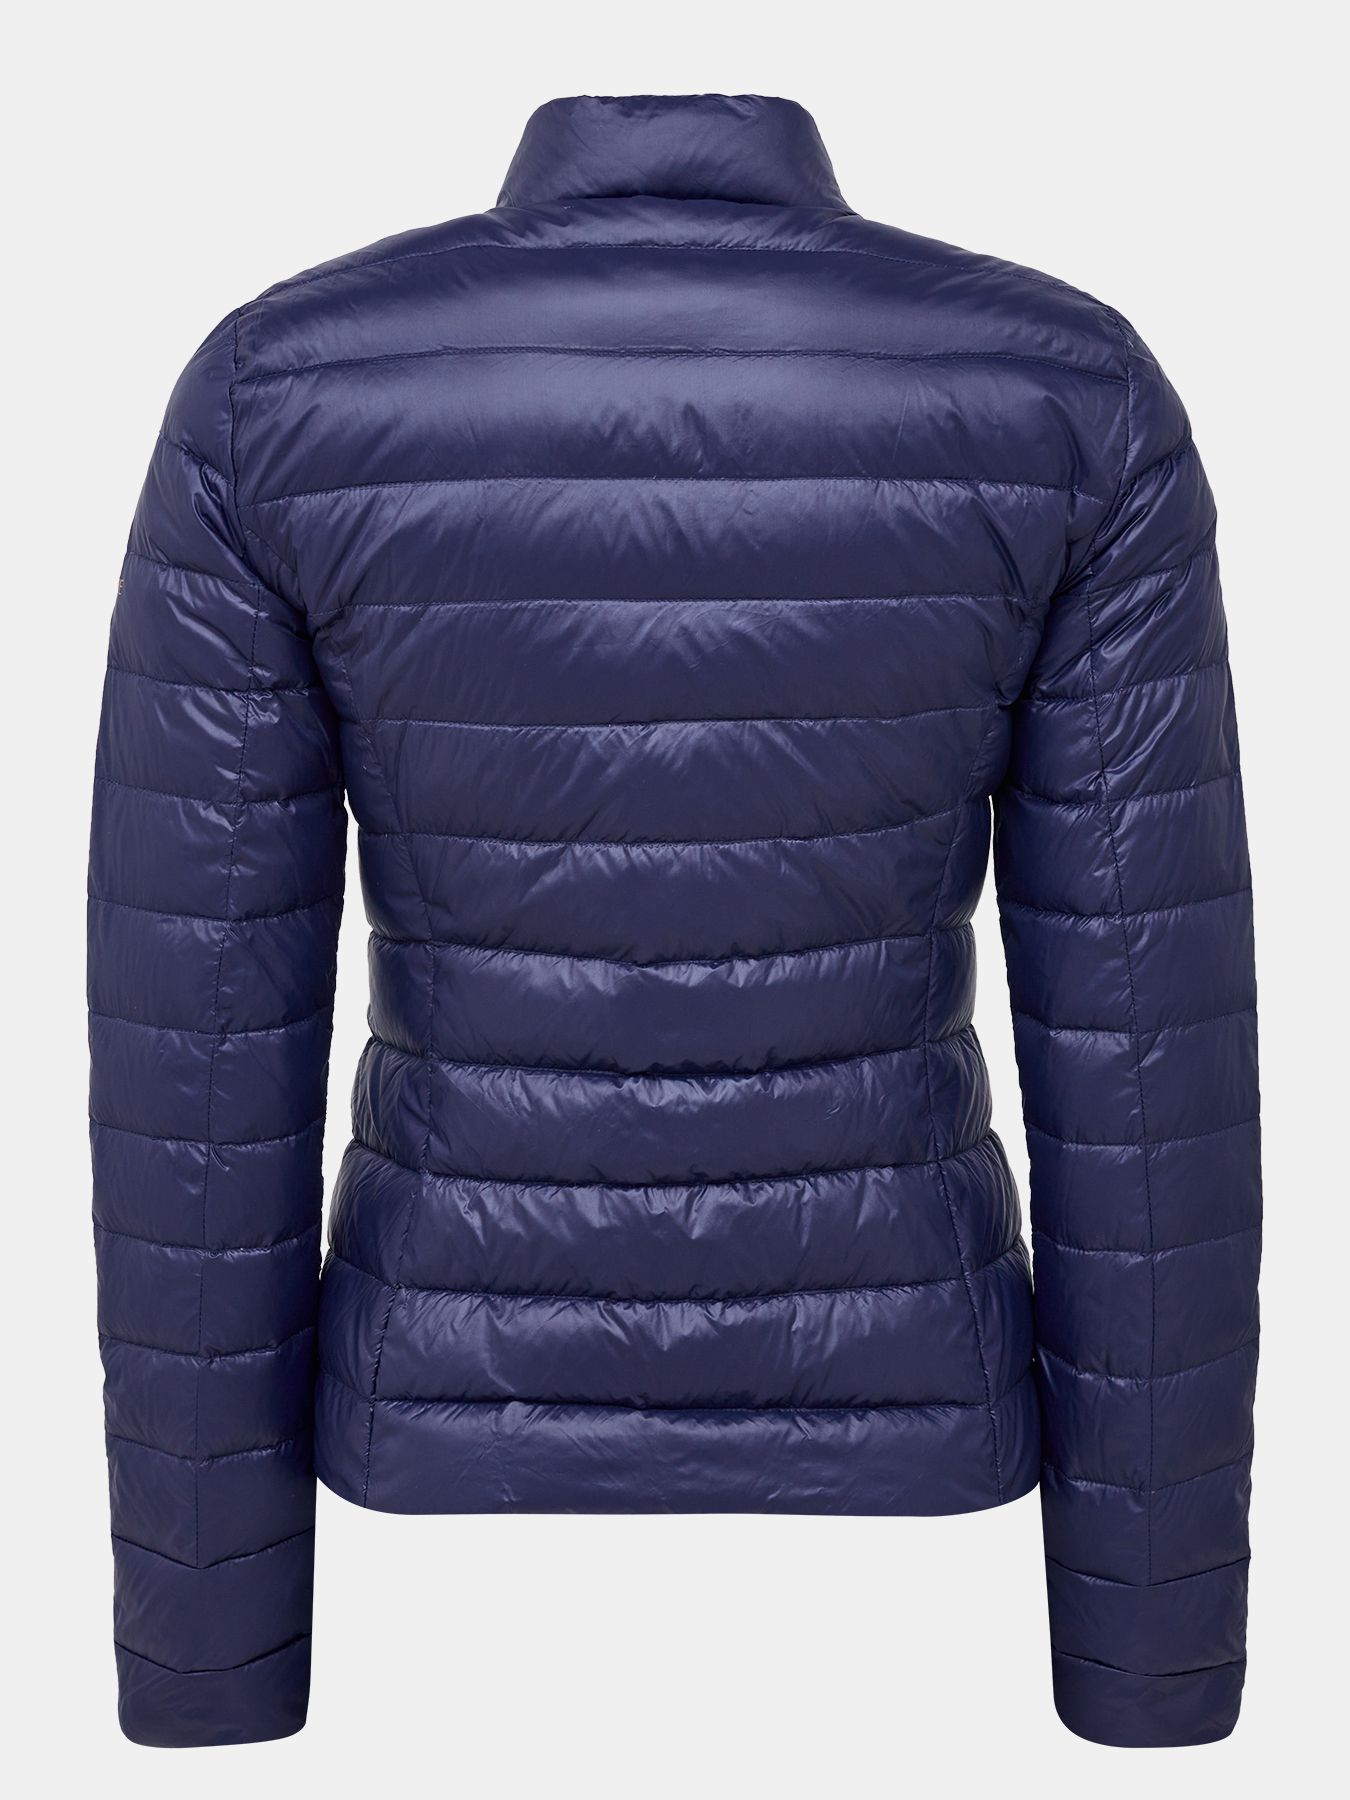 Куртка Patrizia Pepe Двусторонняя куртка куртка patrizia pepe 8l0210 a2hs k103